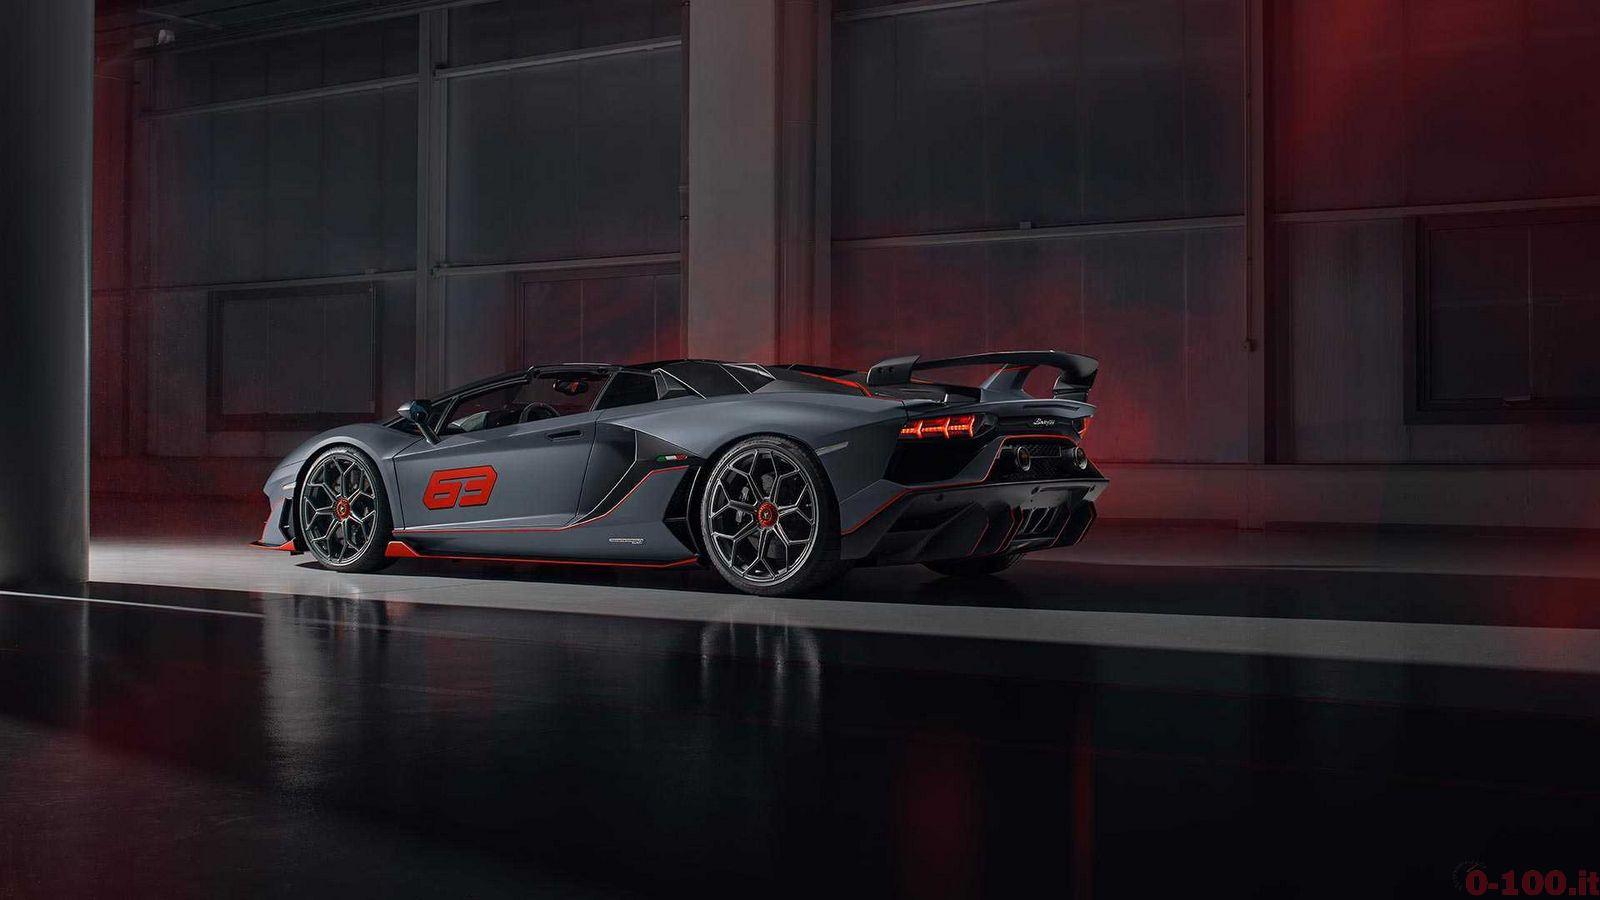 Lamborghini_Aventador_SVJ_63_Roadster_0-100_7